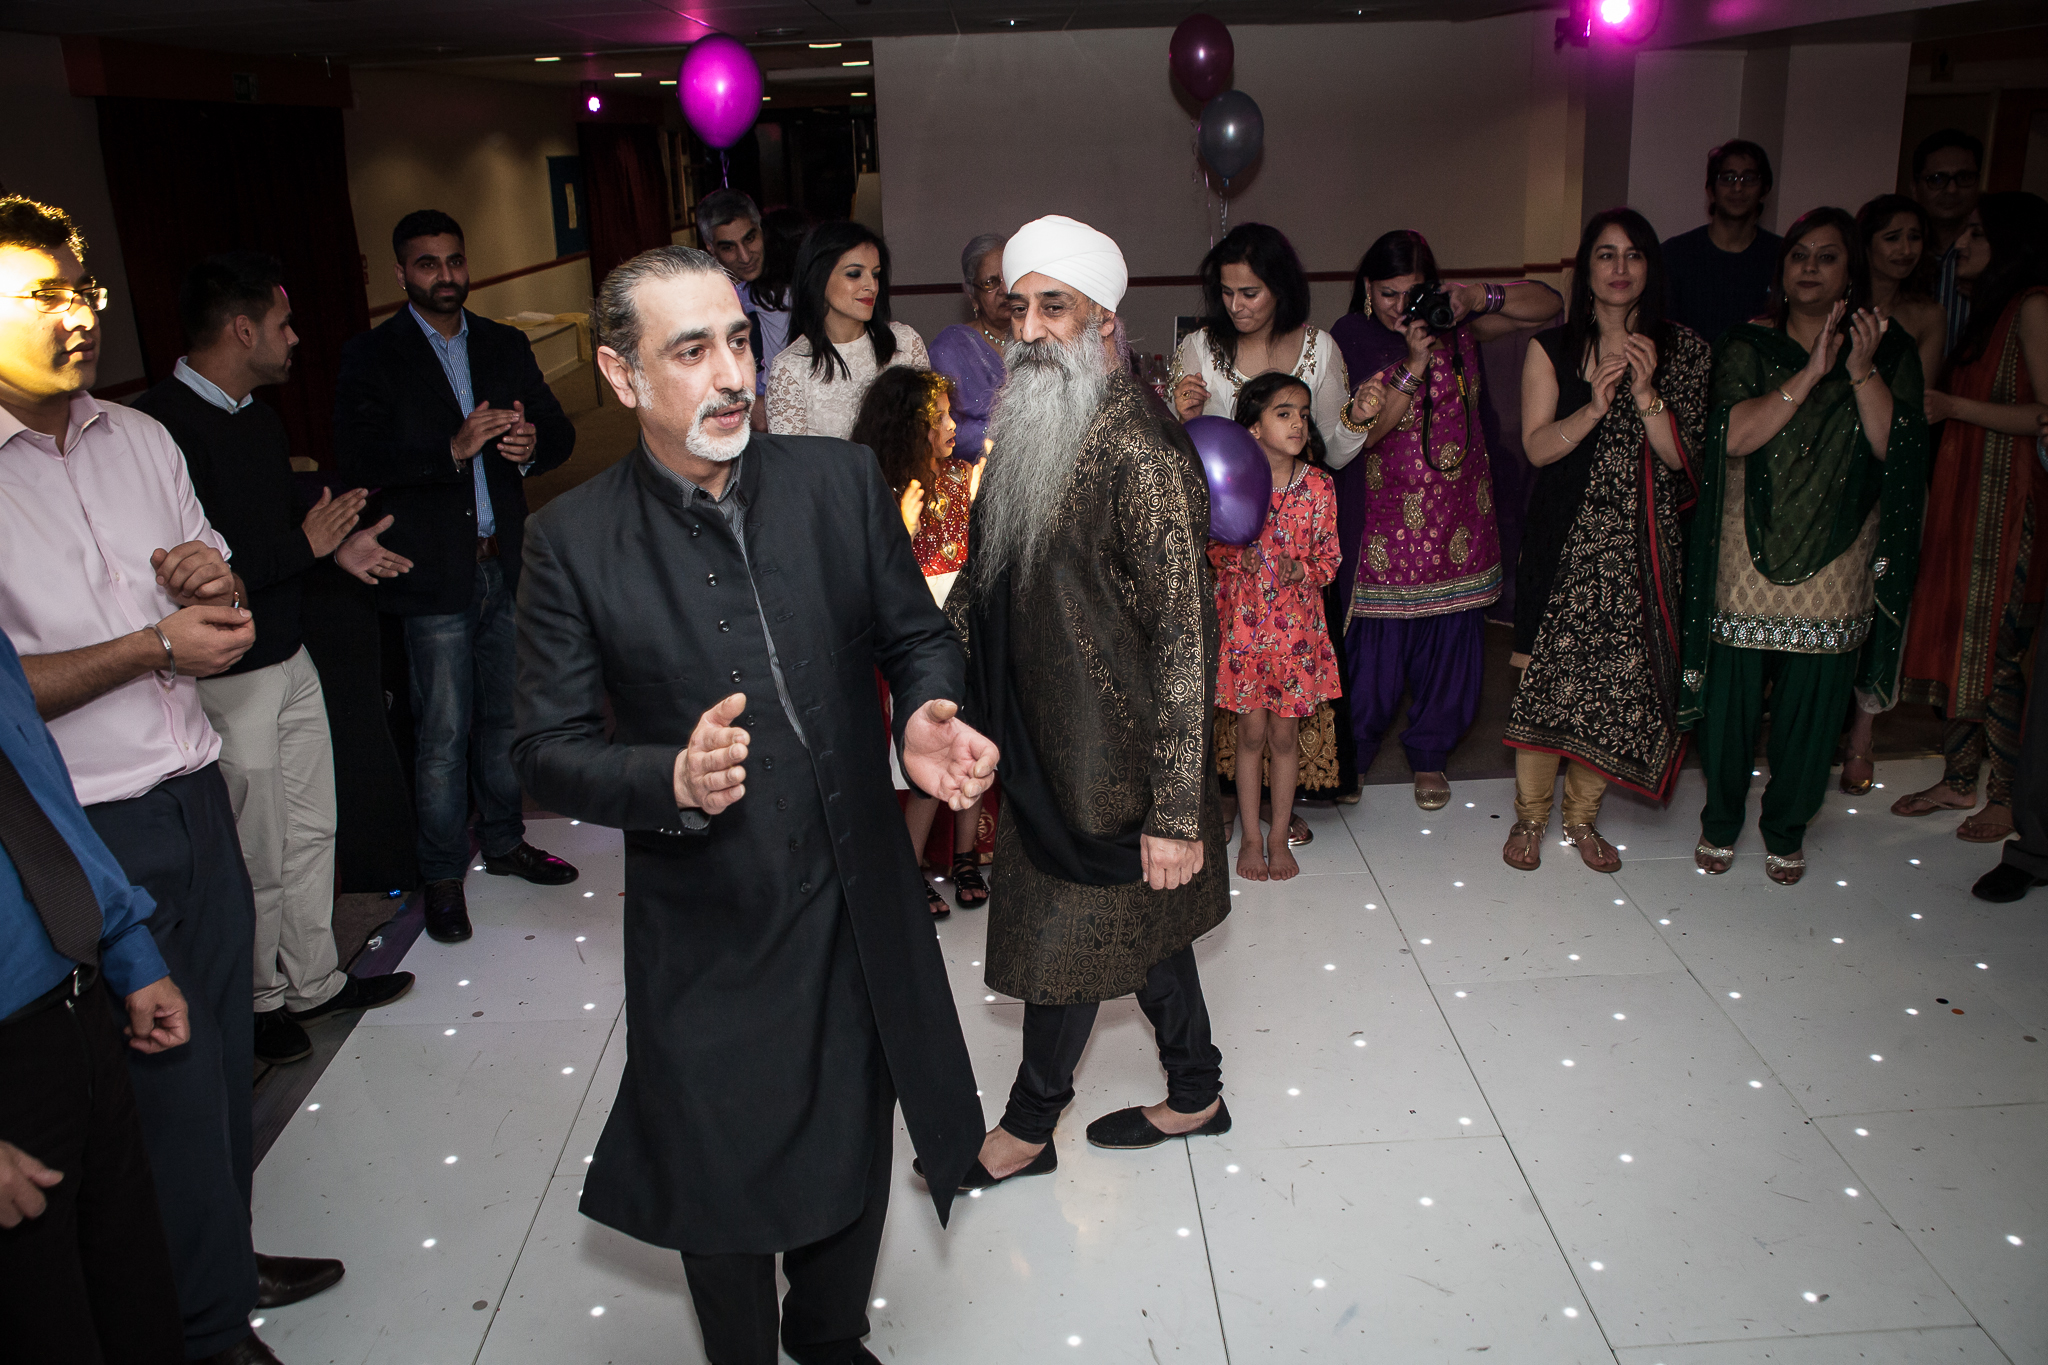 Sikh birthday party photography